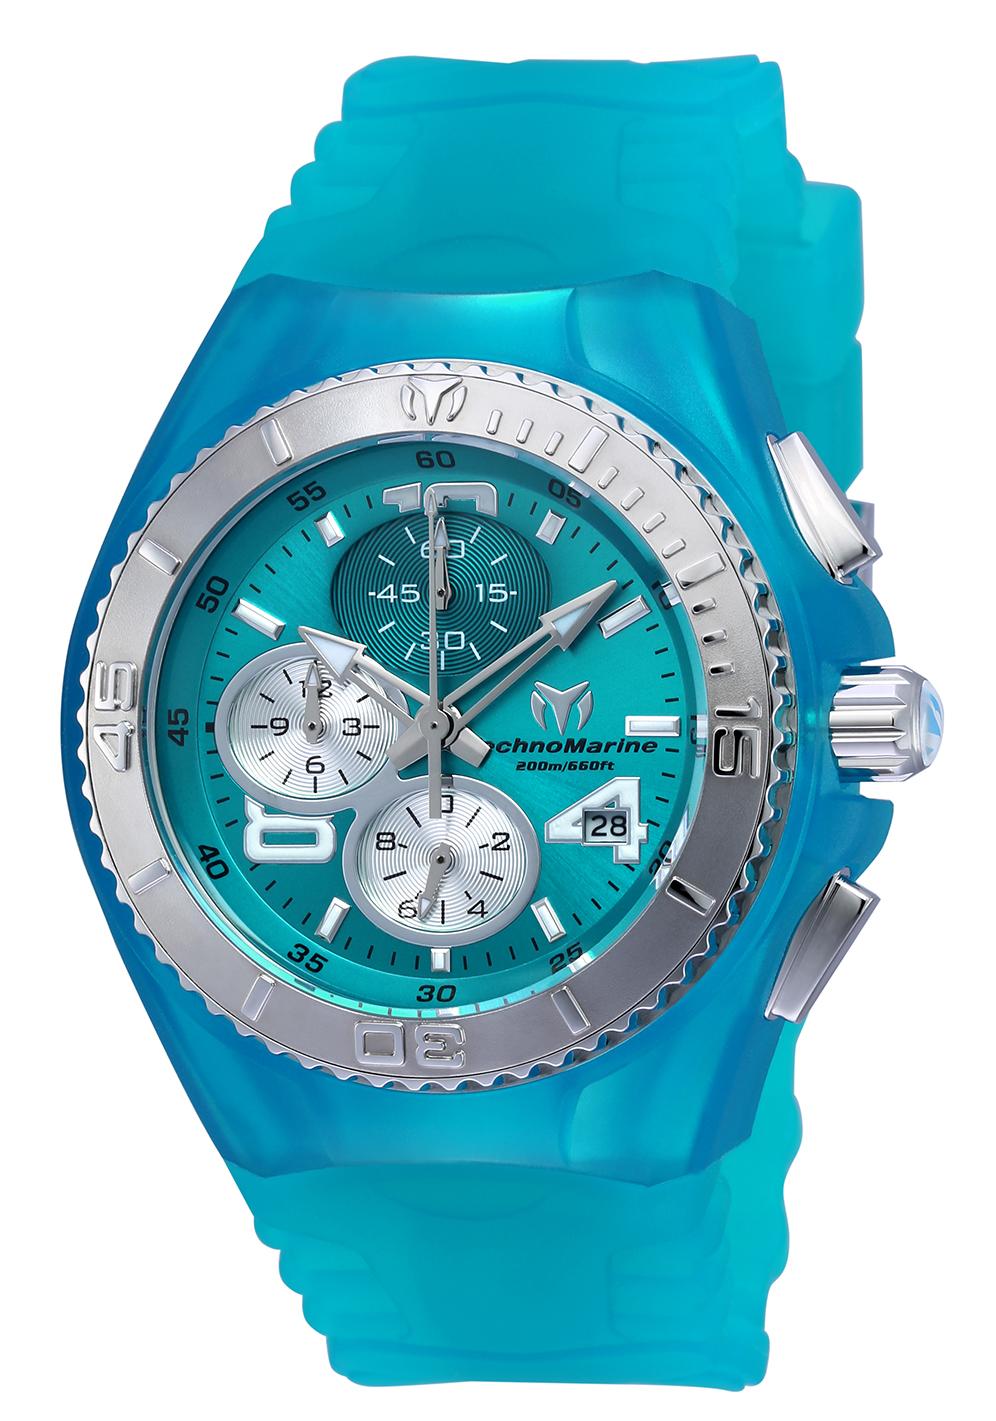 TR Women's TM-115106 Cruise JellyFish Quartz Turquoise Dial Watch